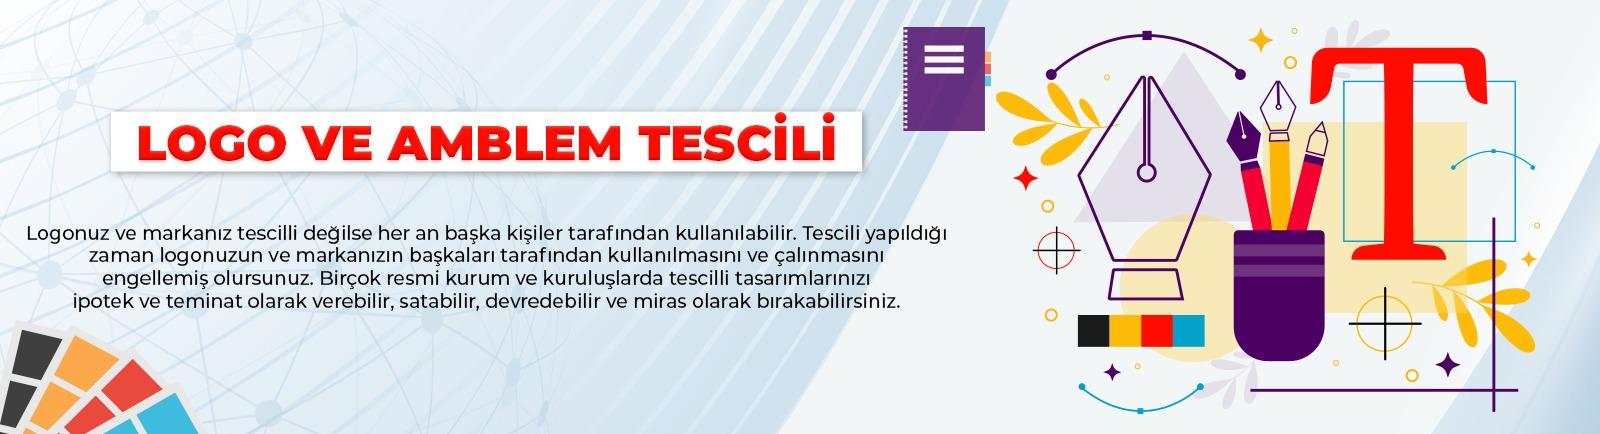 Logo ve Amblem (Tasarım) Tescili